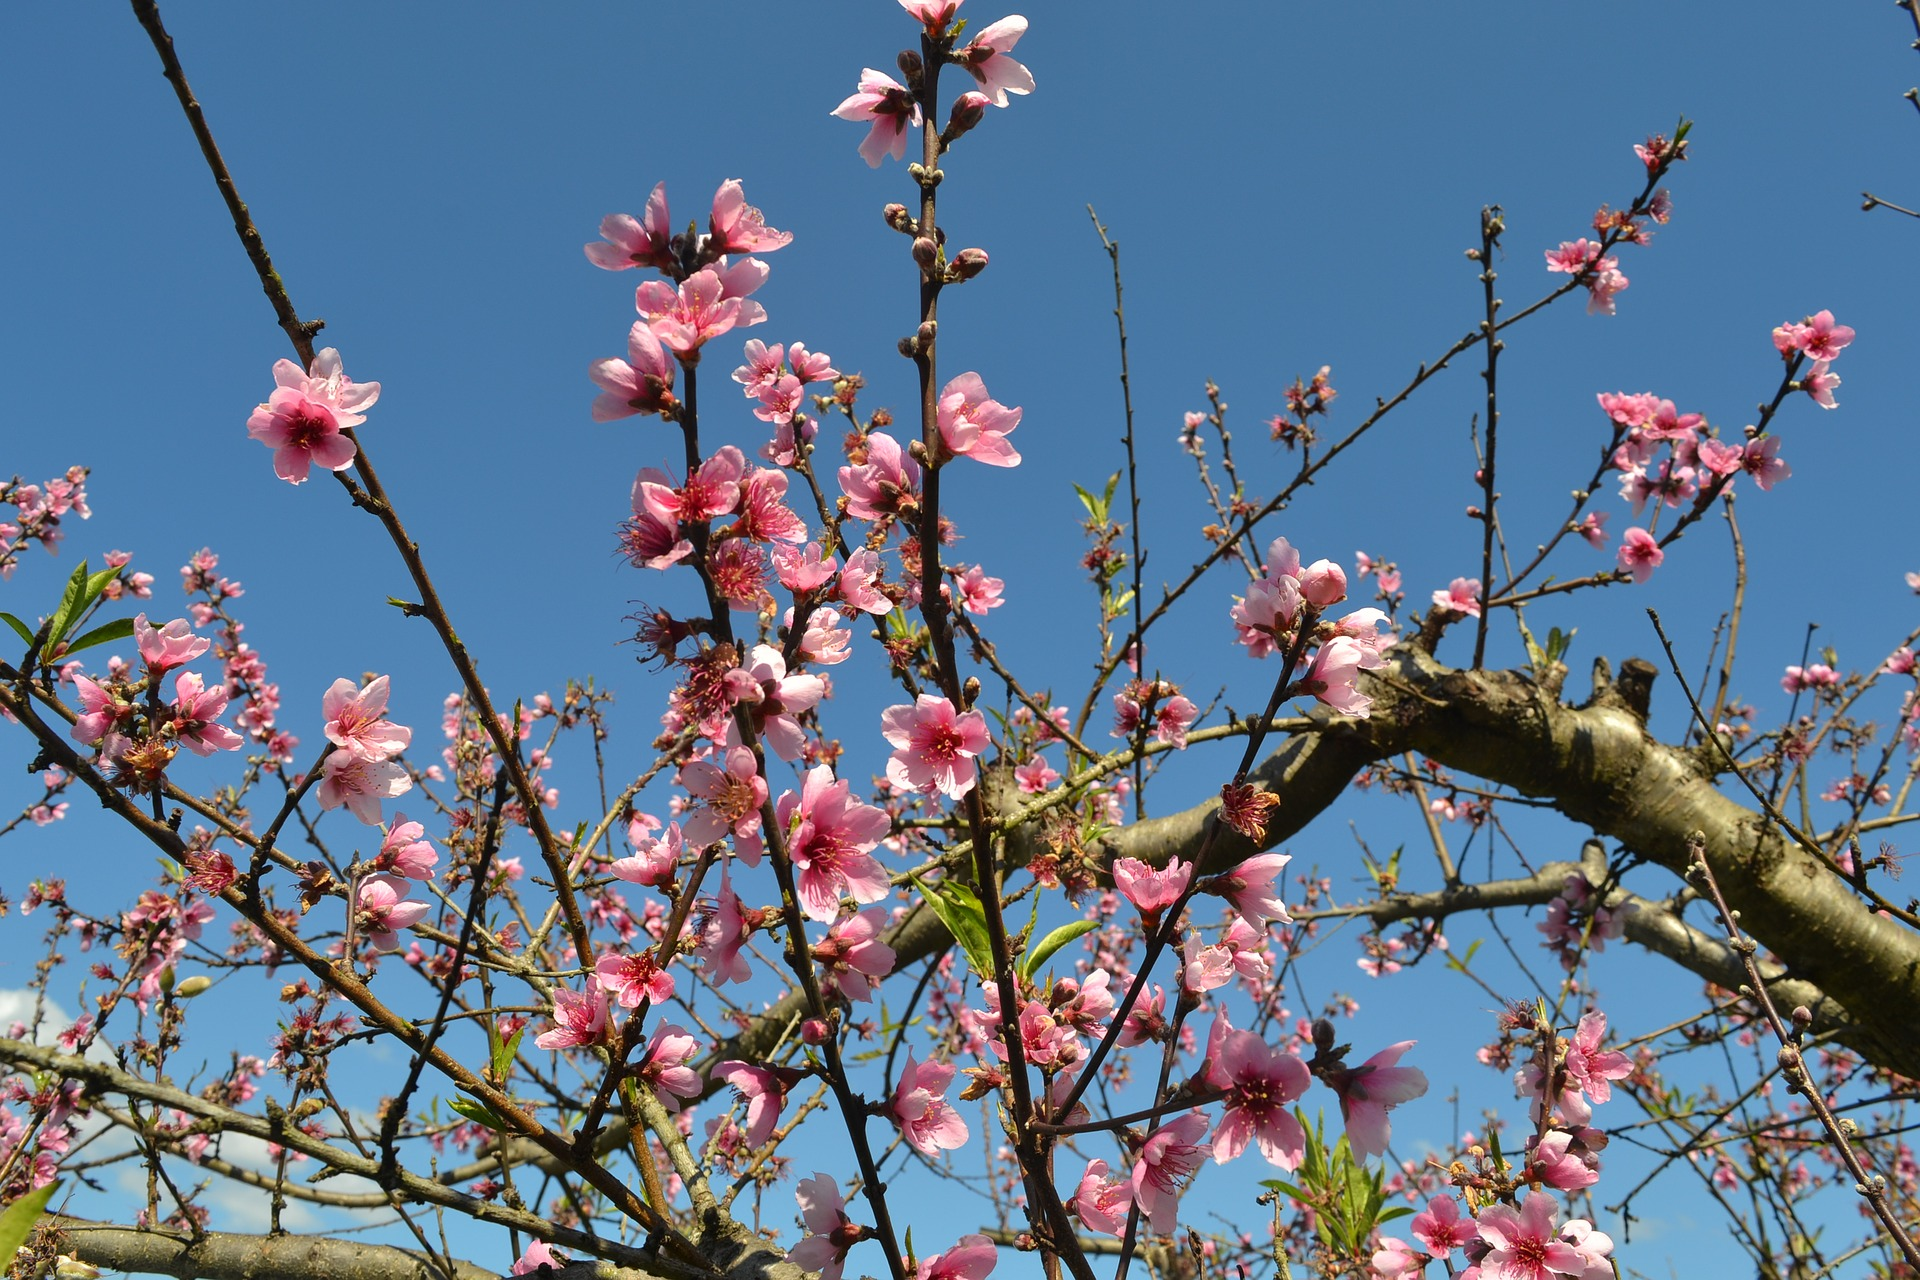 peach blossoms on blue sky